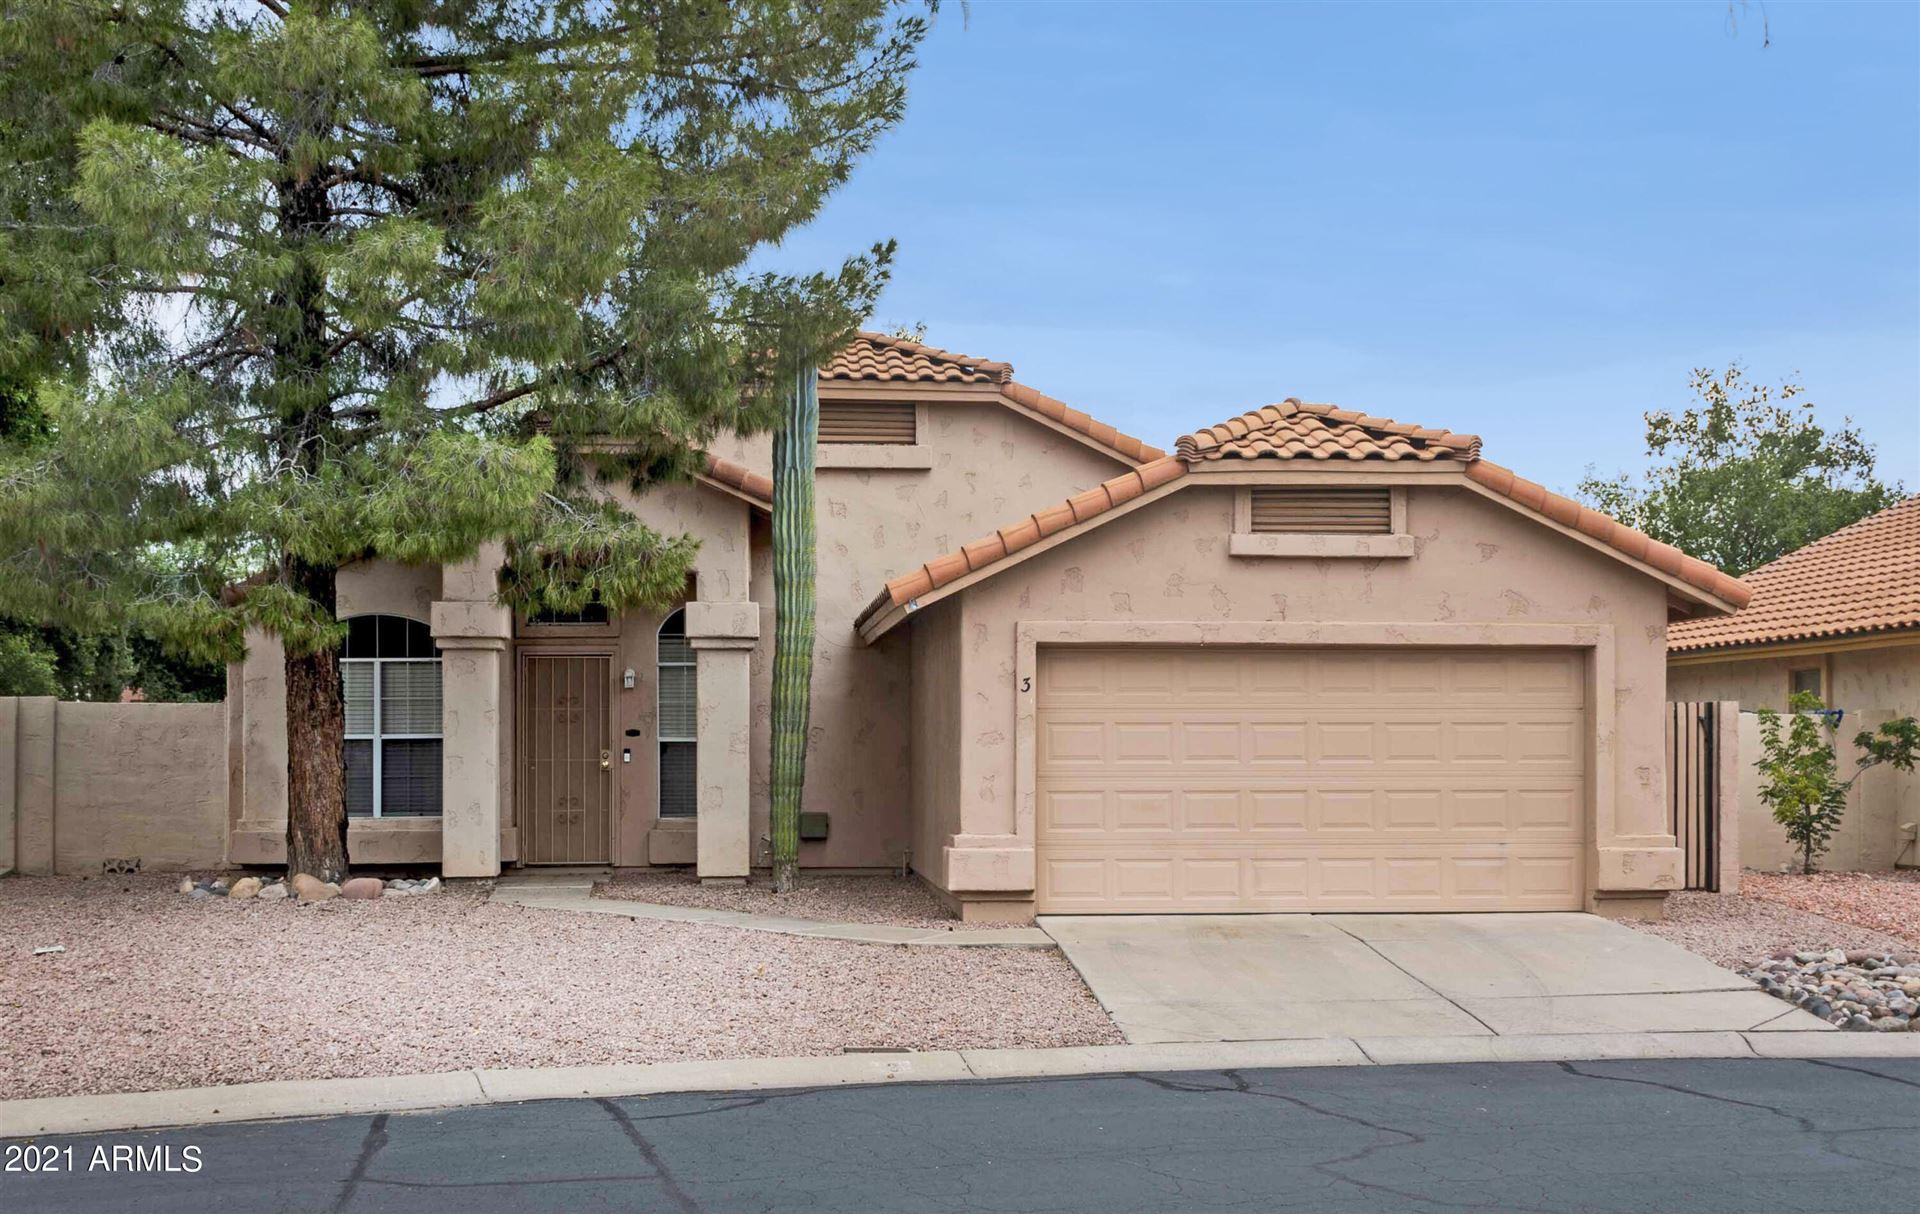 2560 N LINDSAY Road #3, Mesa, AZ 85213 - MLS#: 6295201